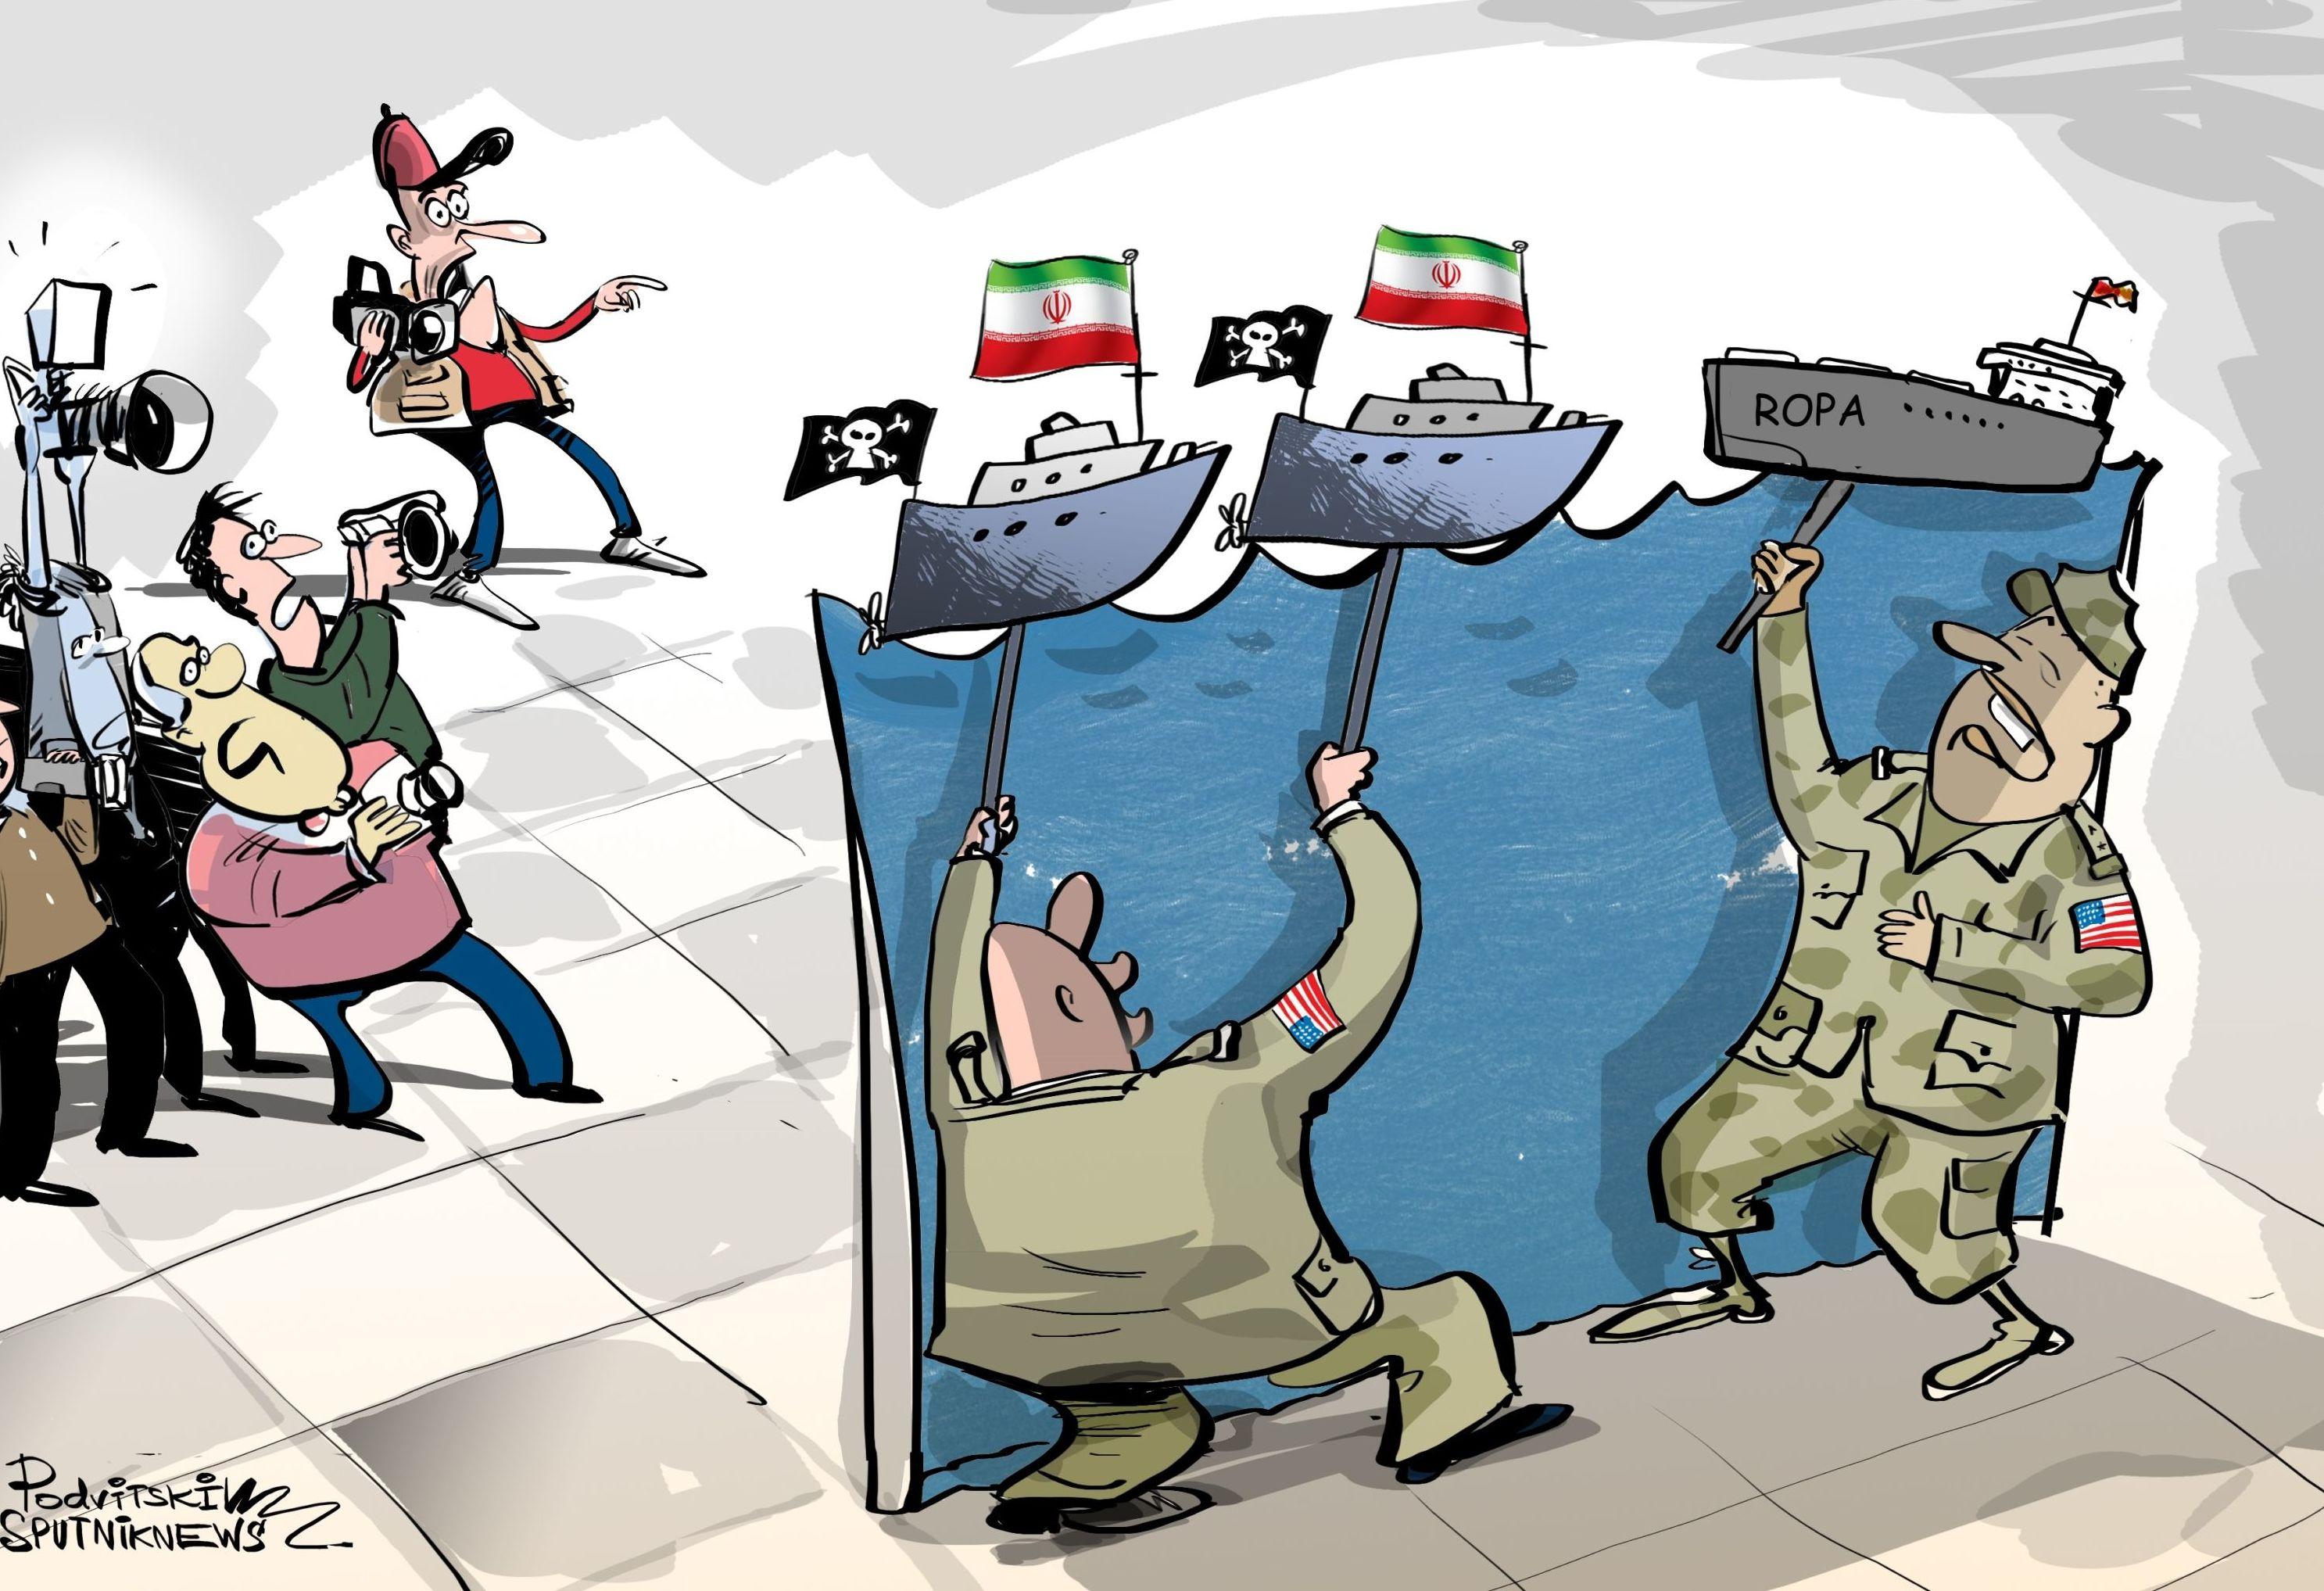 Američané vždy poukazují na účast Íránu.